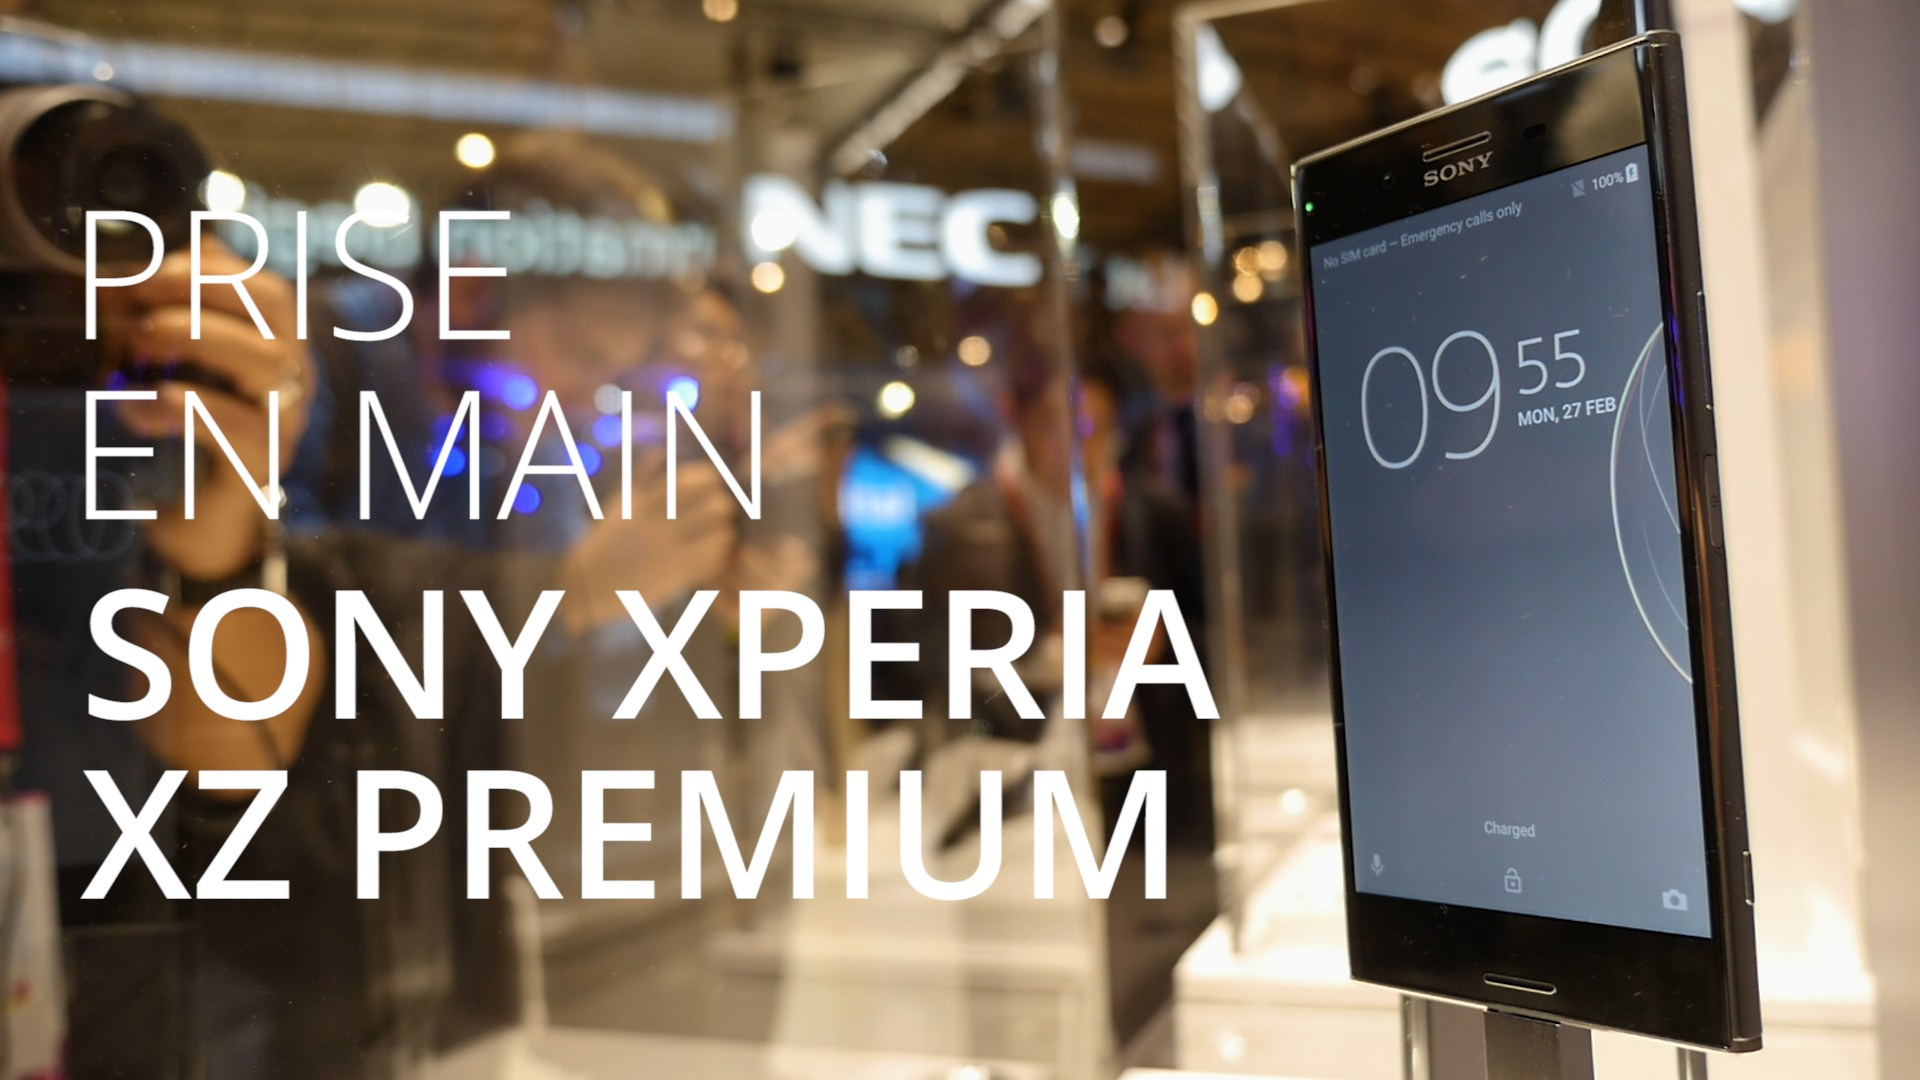 Sony Xperia XZ Premium : nos impressions en vidéo au MWC 2017